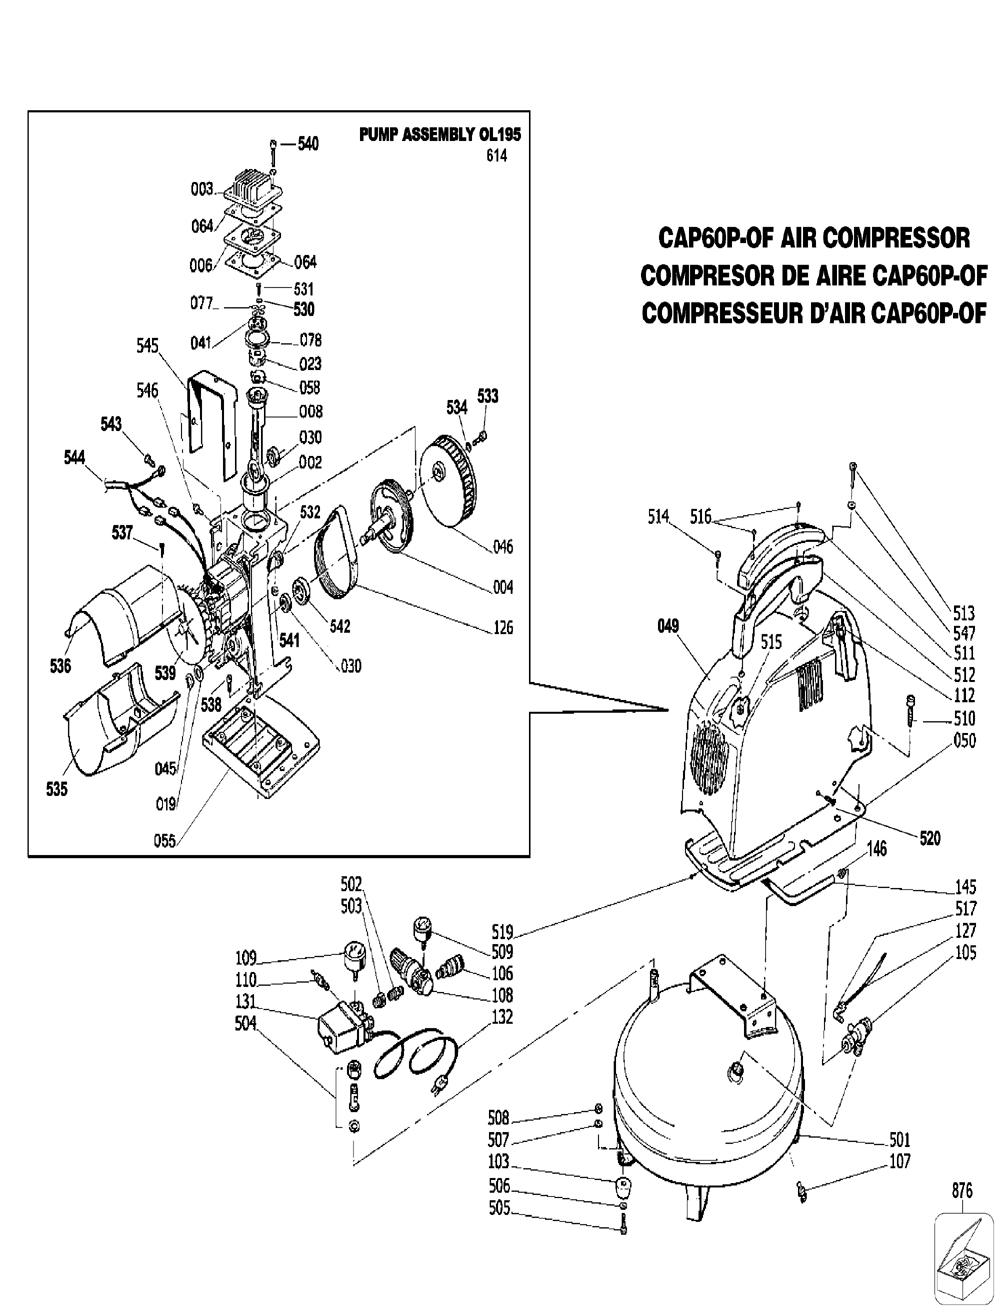 bostitch air compressor parts diagram  bostitch parts